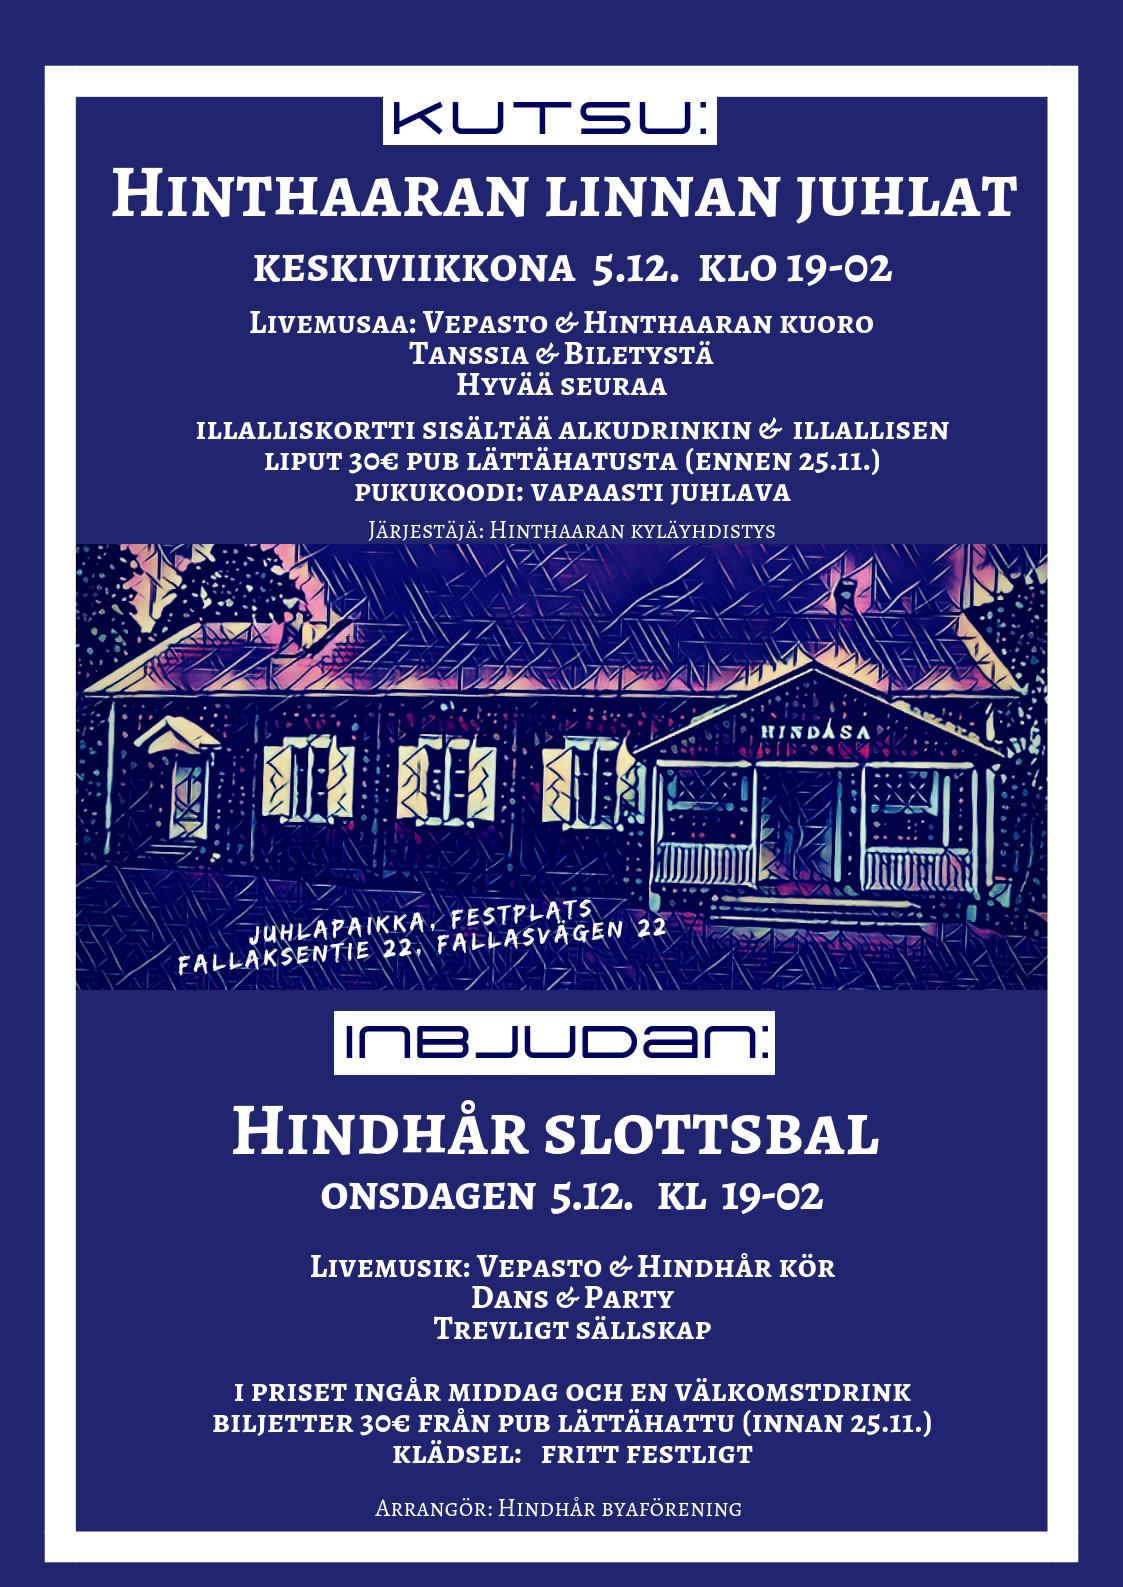 2018_Hinthaaran linnanjuhlat_A3.png